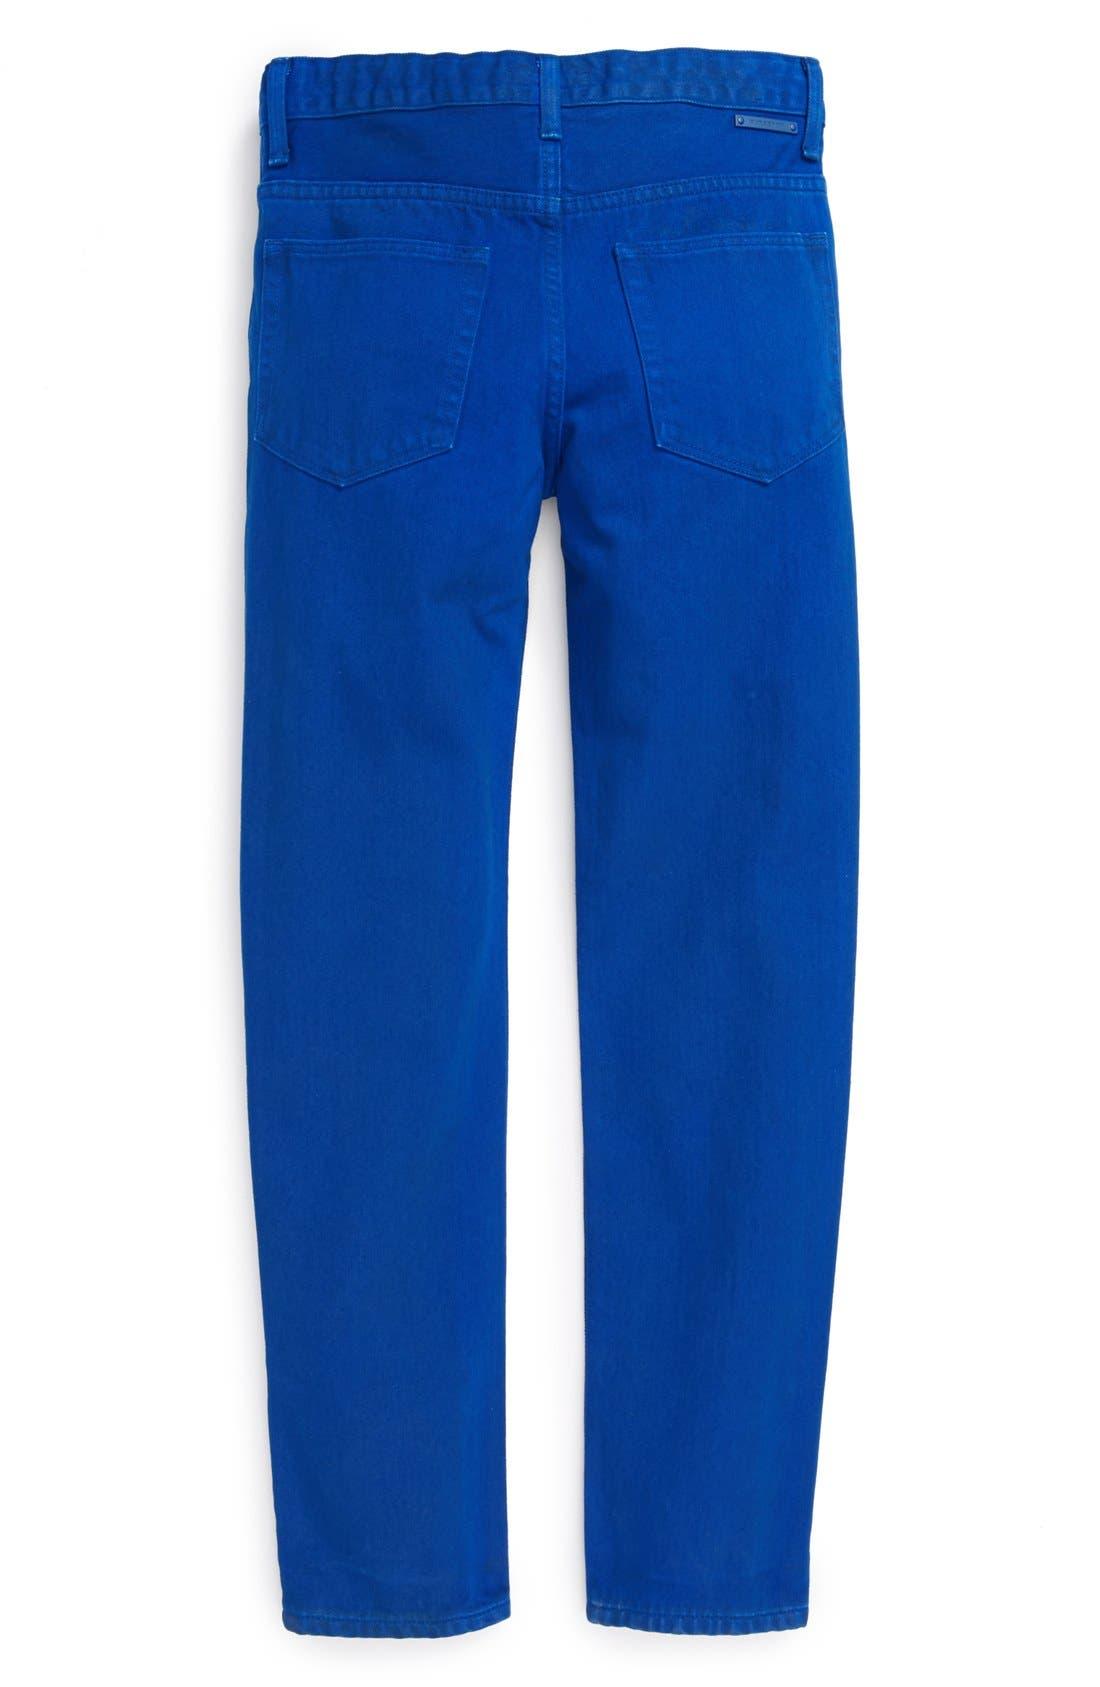 Main Image - Burberry 'Mini Shoreditch' Skinny Jeans (Little Boys & Big Boys)